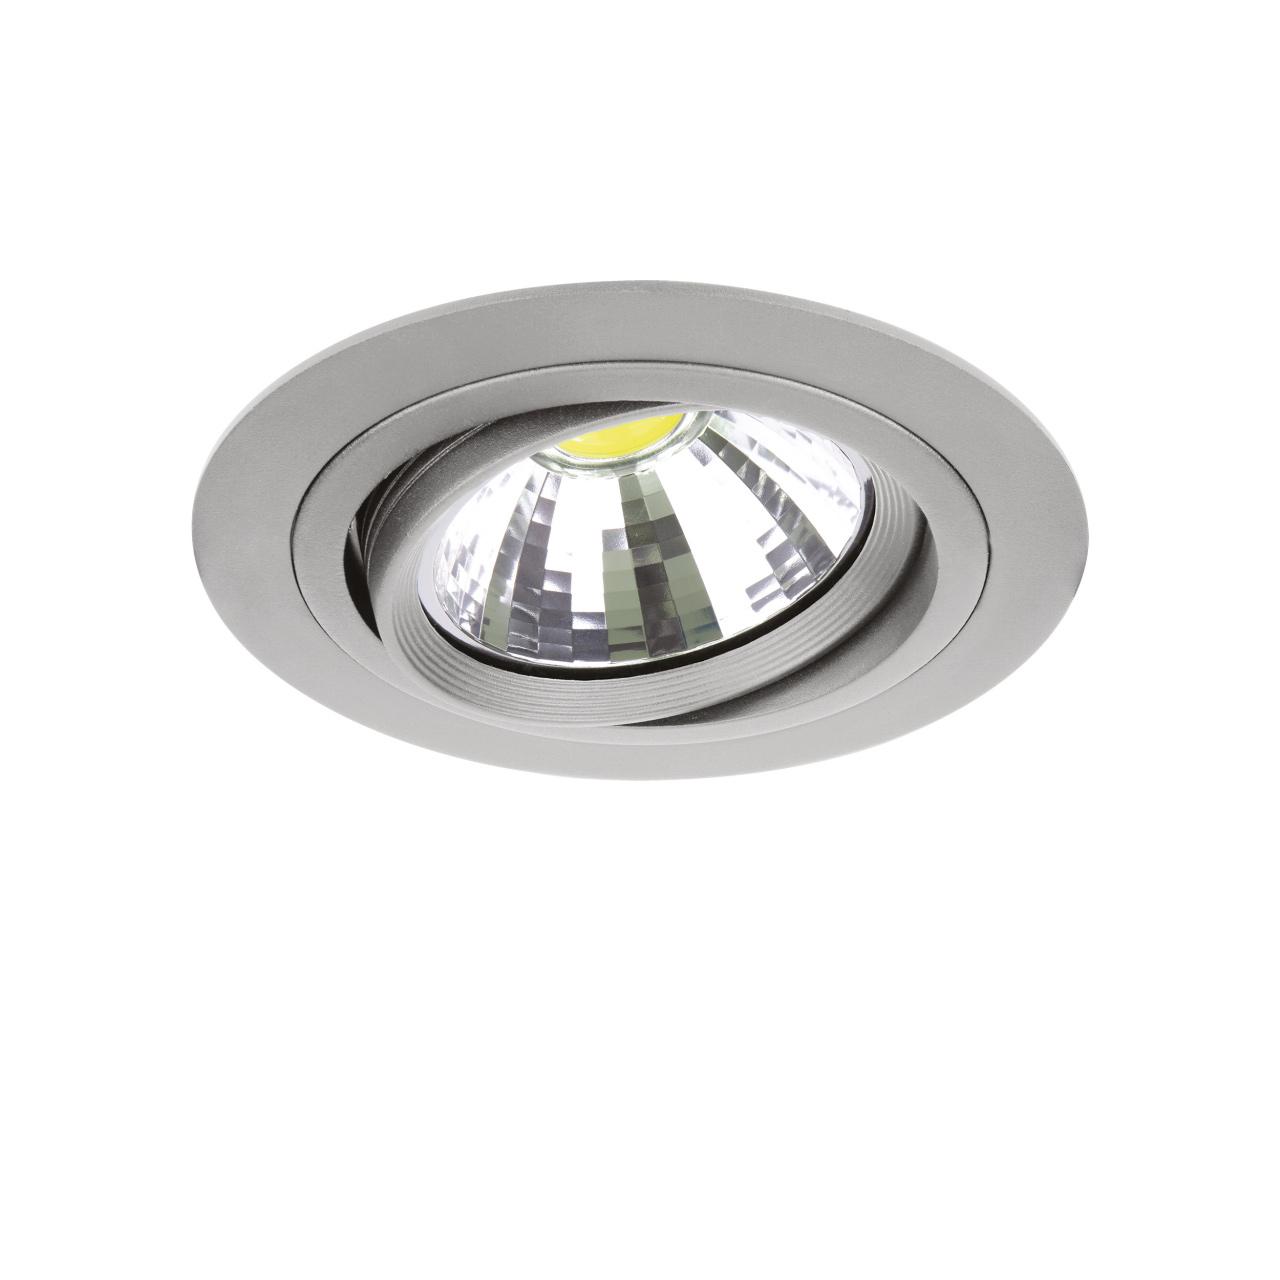 Светильник Intero 111 AR111 серый Lightstar 214319